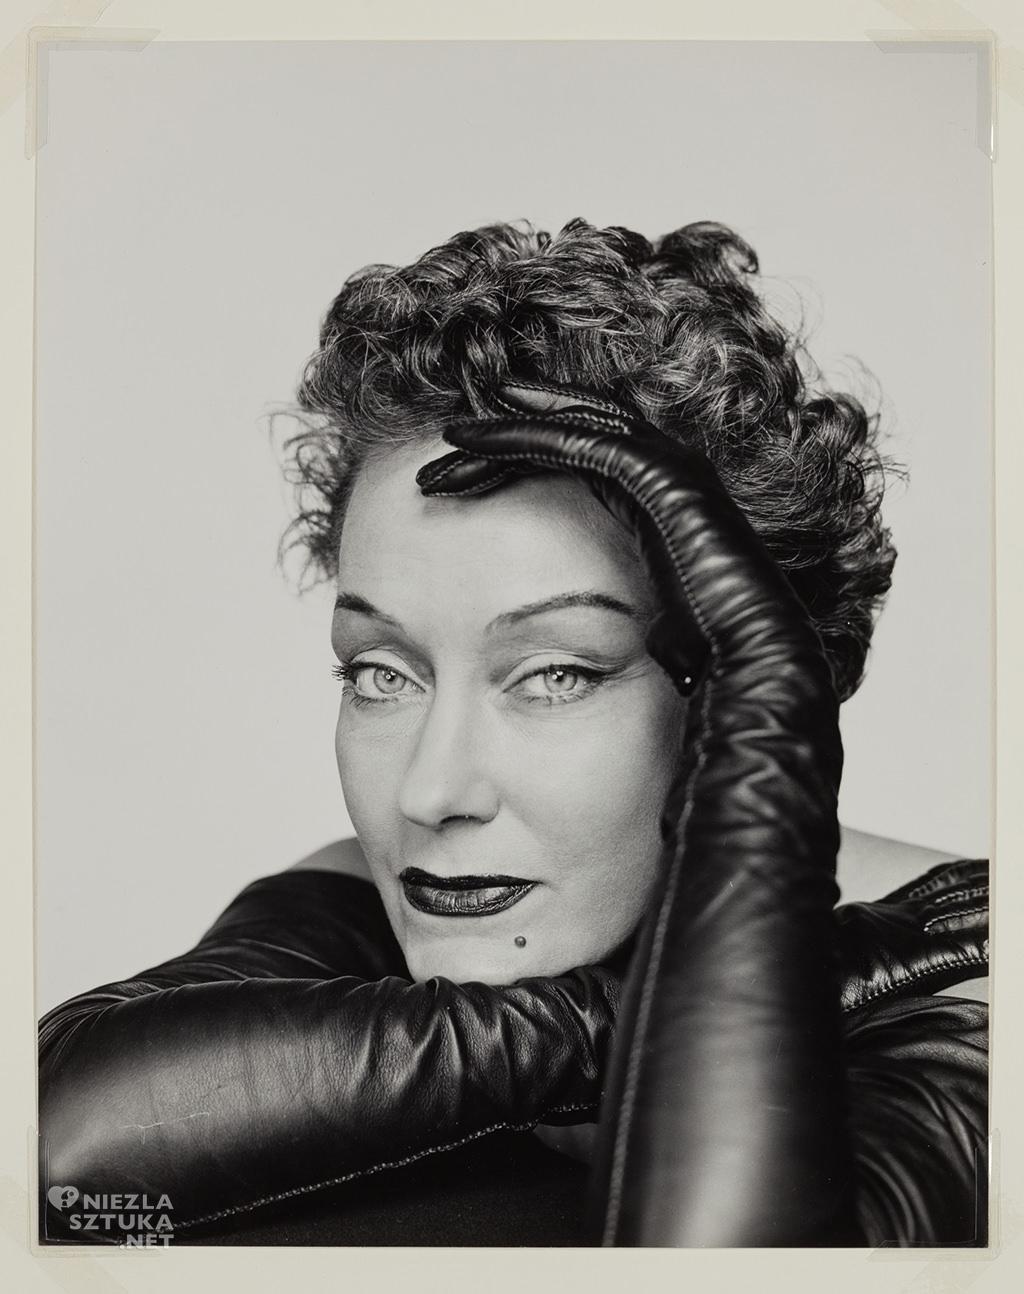 Philippe Halsman Gloria Swanson, 1950, Detroit Insitute of Art